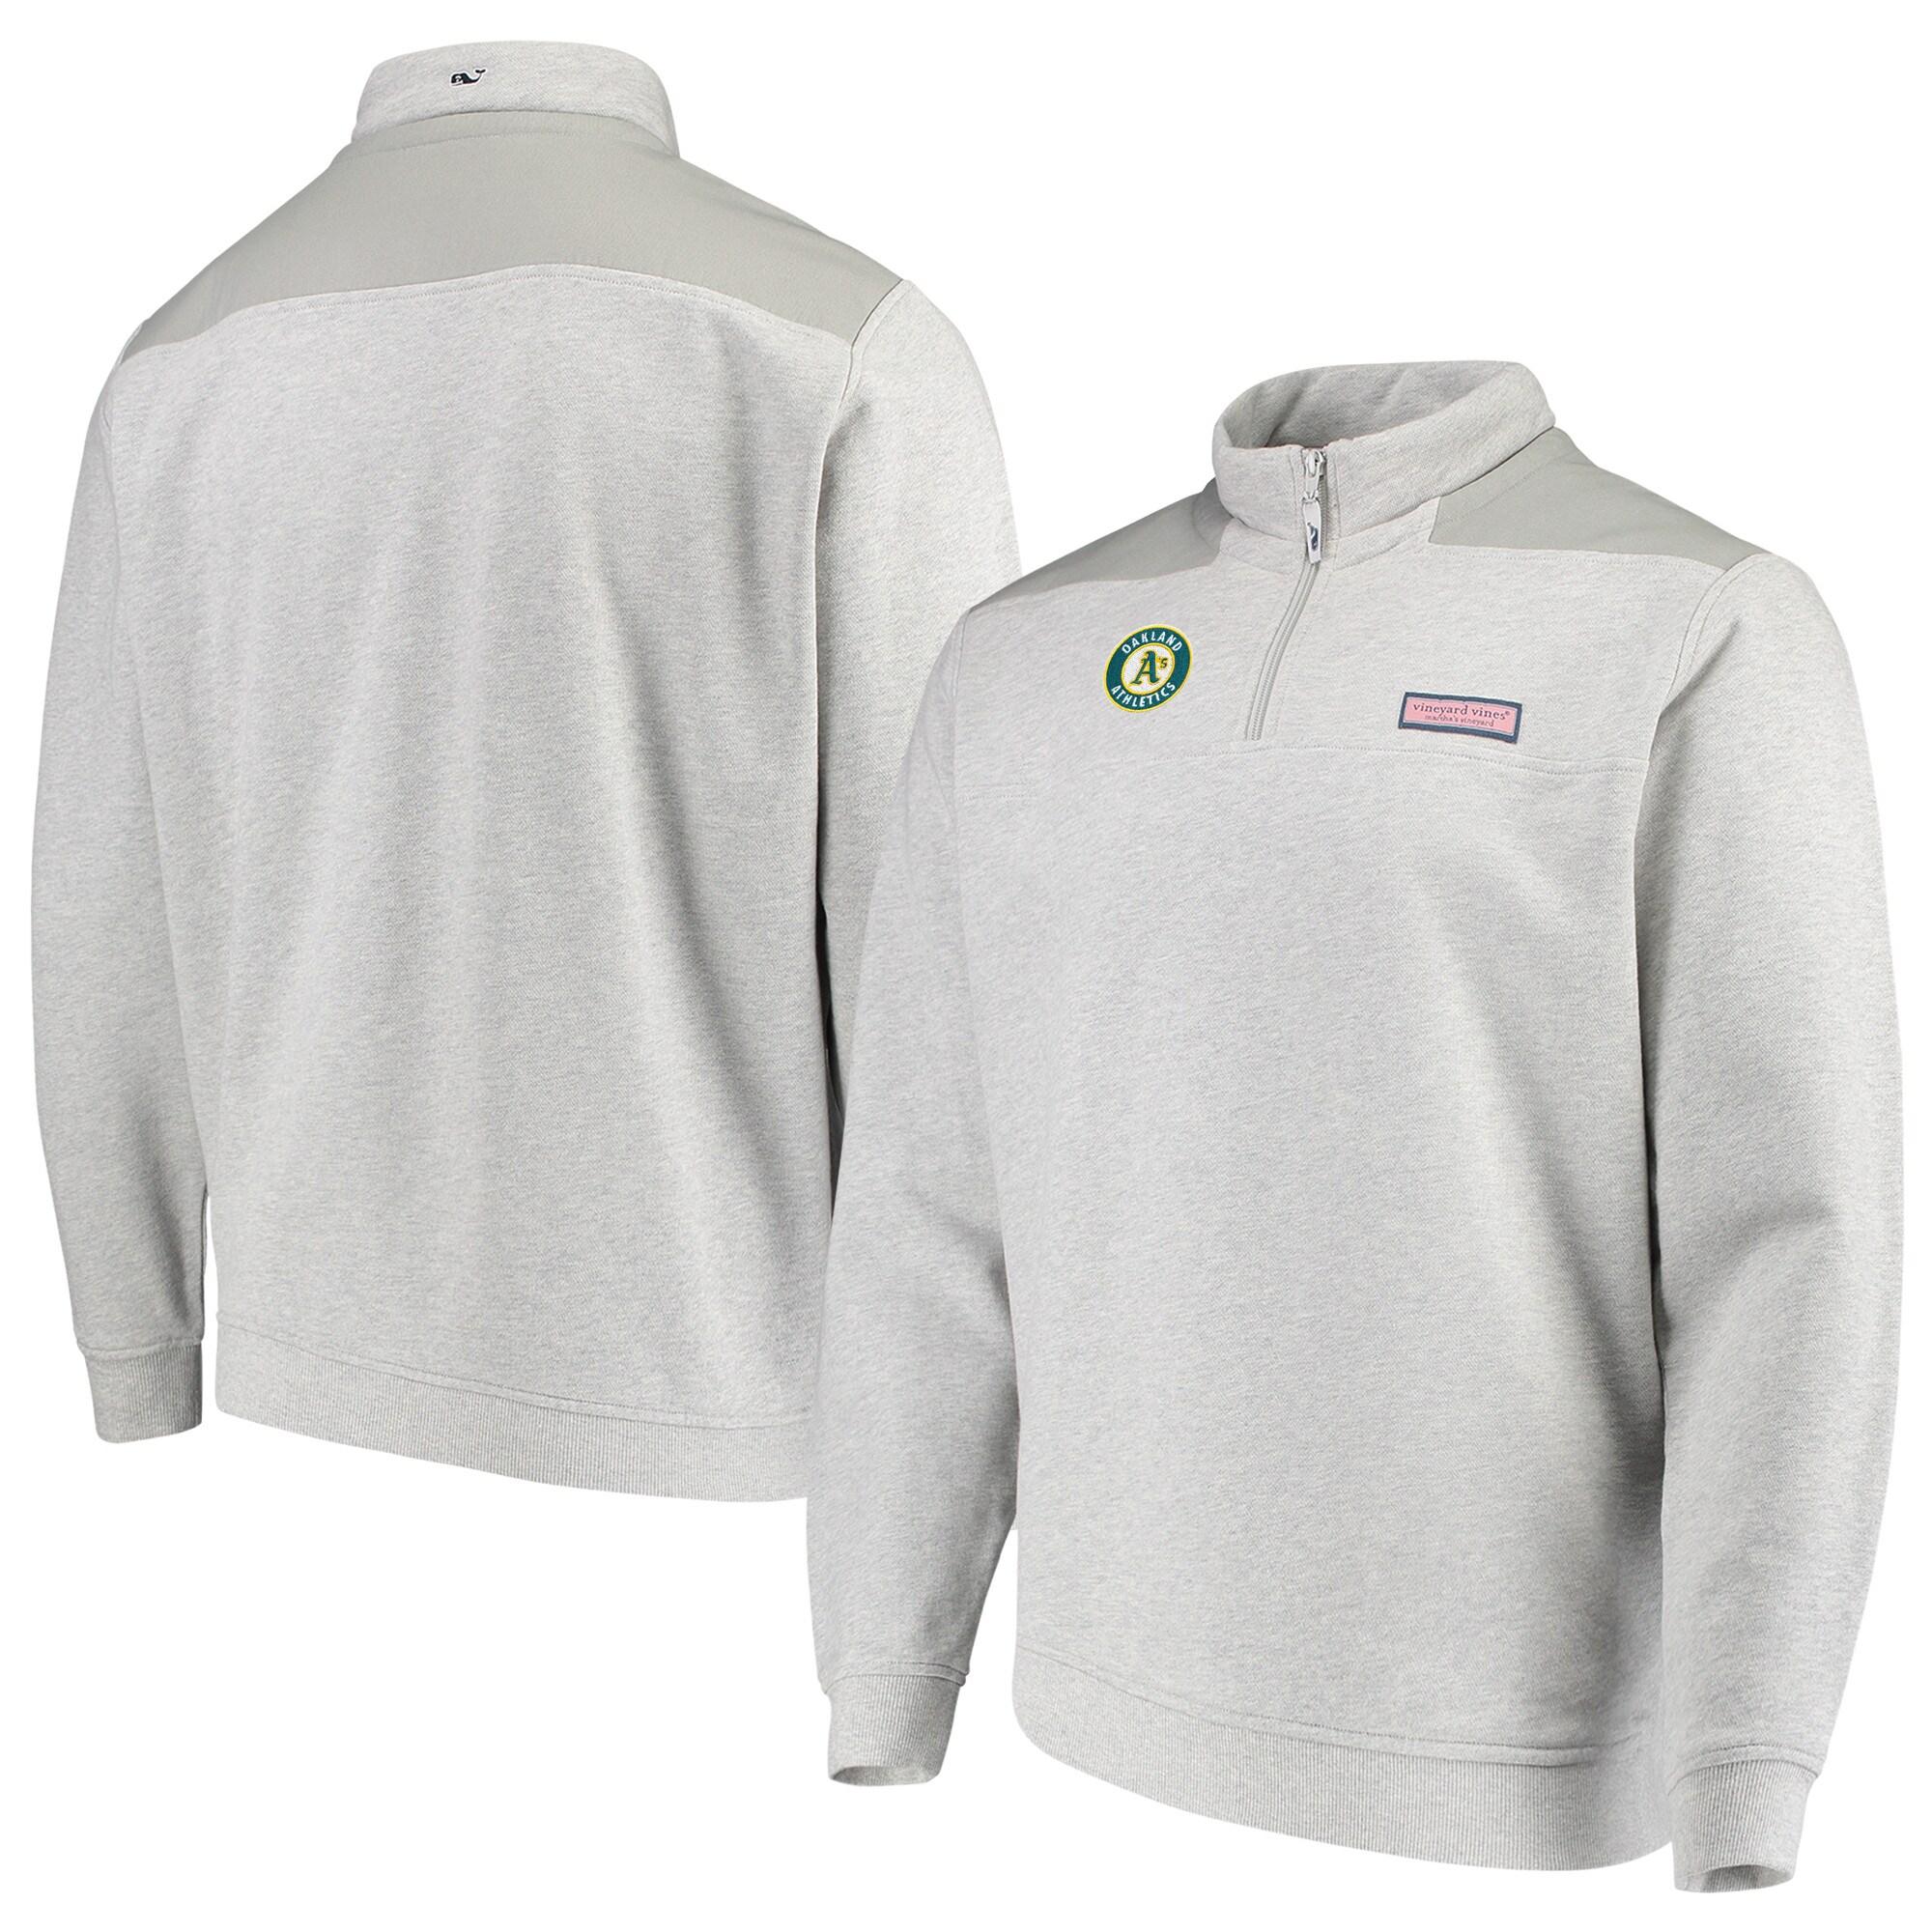 Oakland Athletics Vineyard Vines Shep Shirt Quarter-Zip Pullover Jacket - Gray